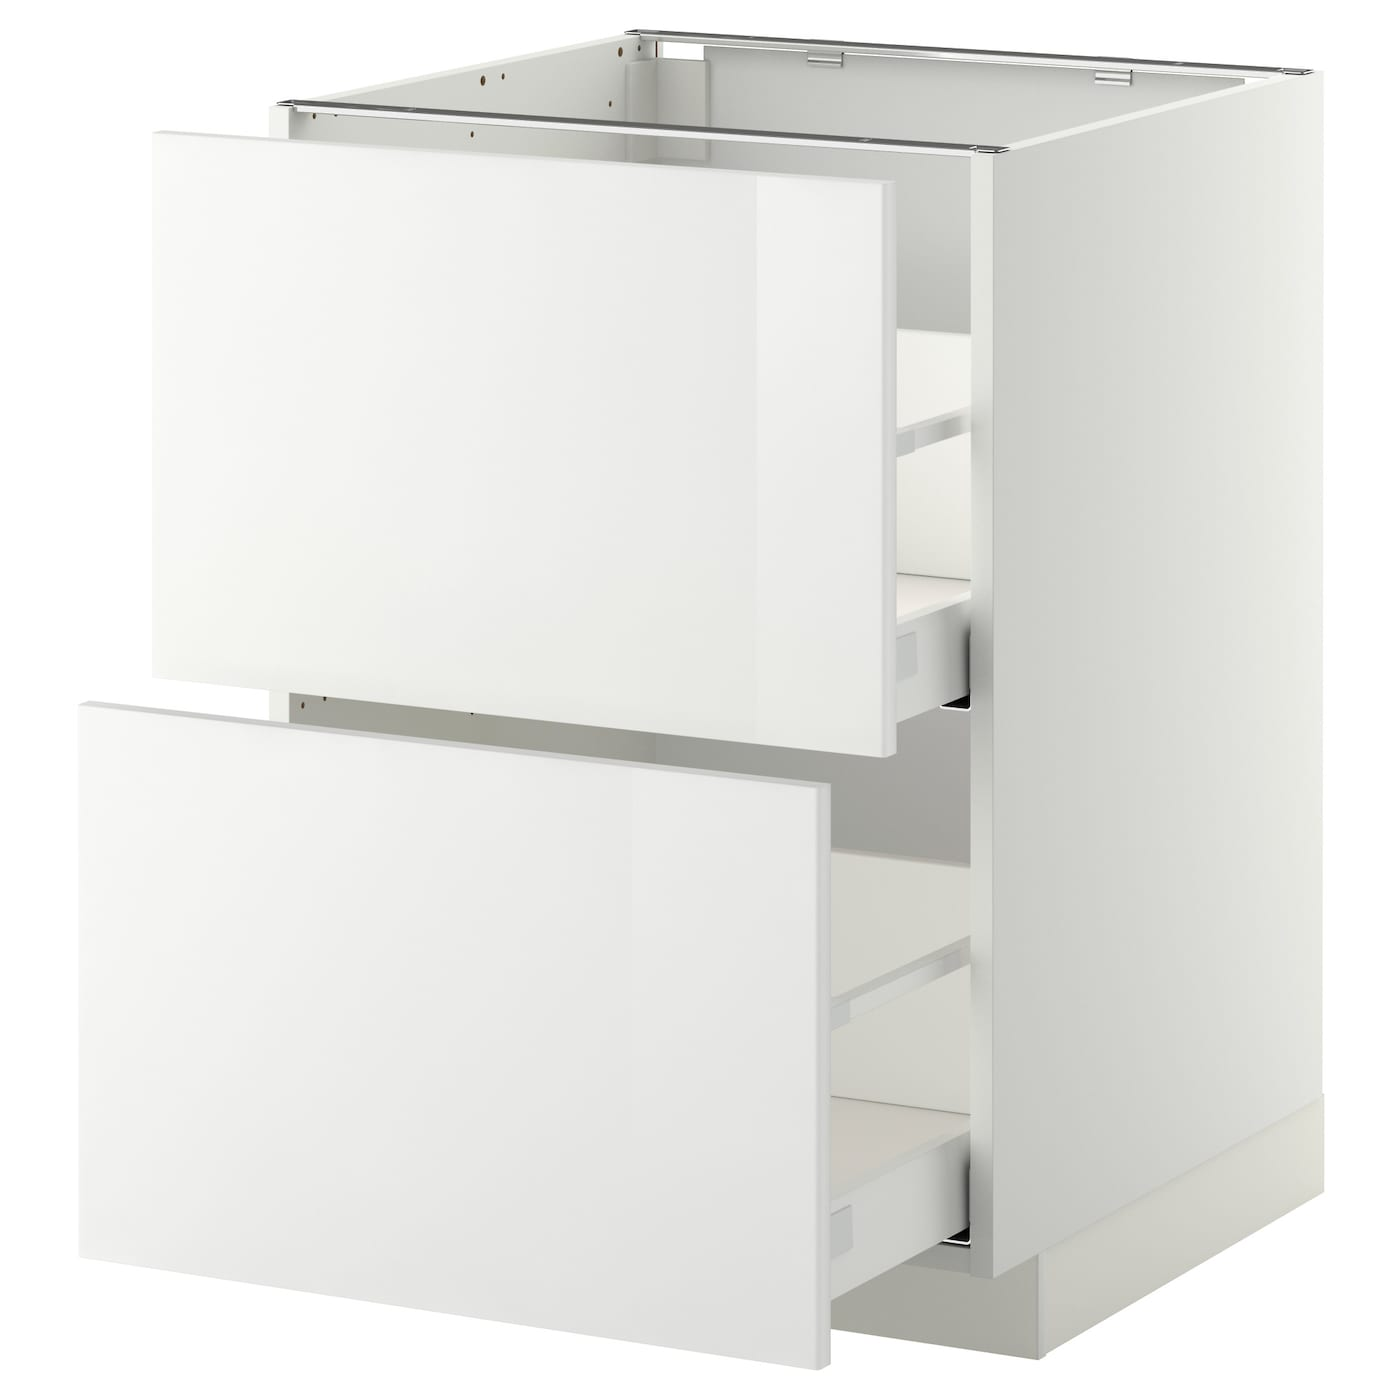 METOD / MAXIMERA Élt bas 11 faces/11 tiroirs hauts - blanc/Ringhult blanc  11x11 cm